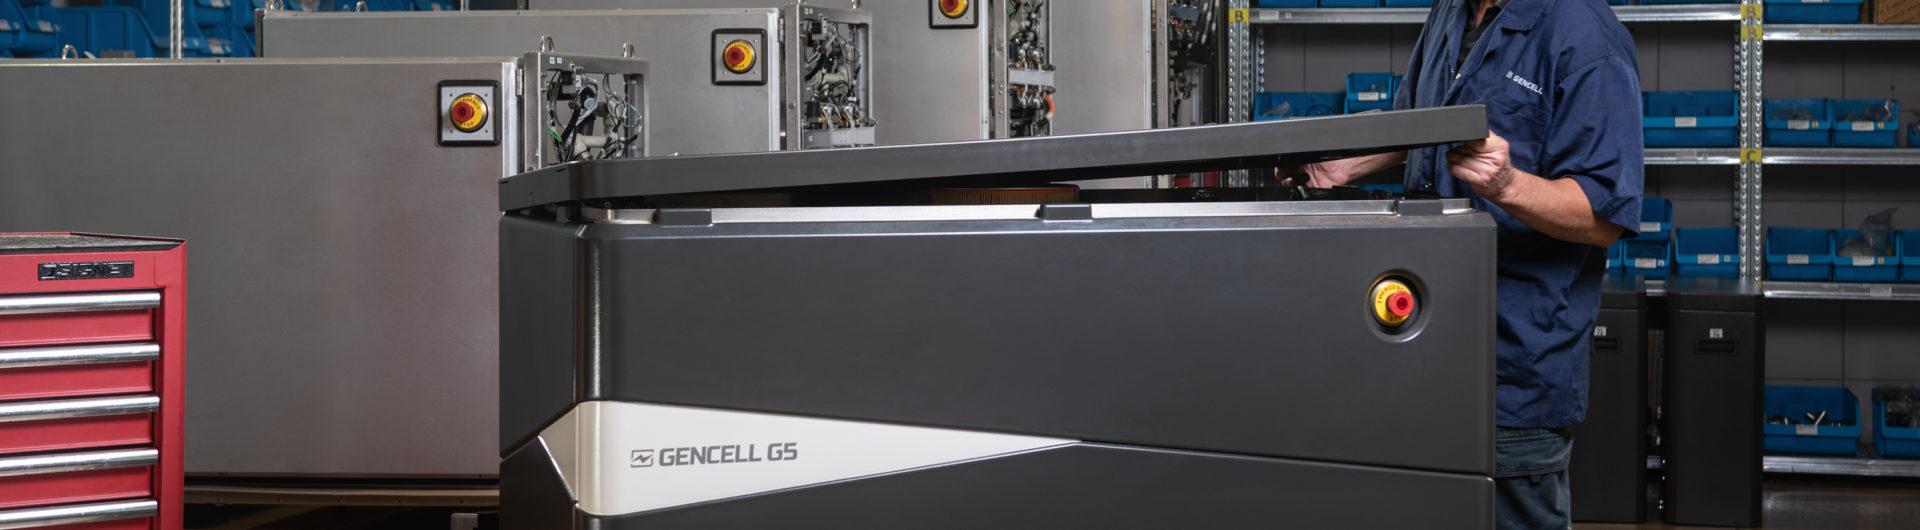 GenCell_fuel_cells